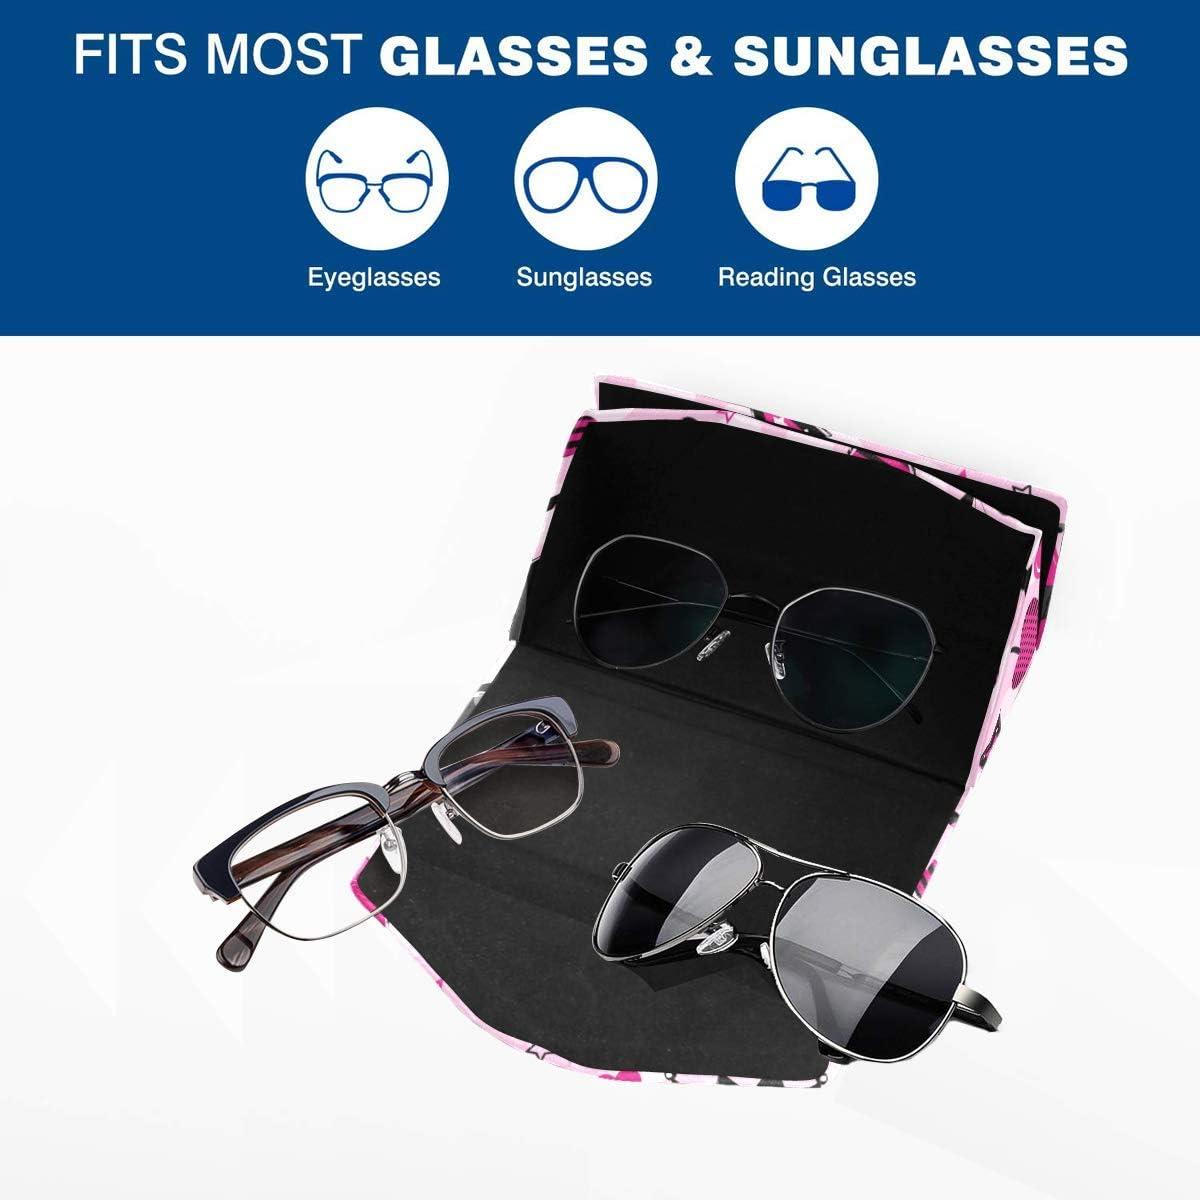 Glasses Case Cute Skull Aggressive Girlis Eyeglass Case Leather Magnetic Folding Hard Case Sunglasses Eyewear Protective Case